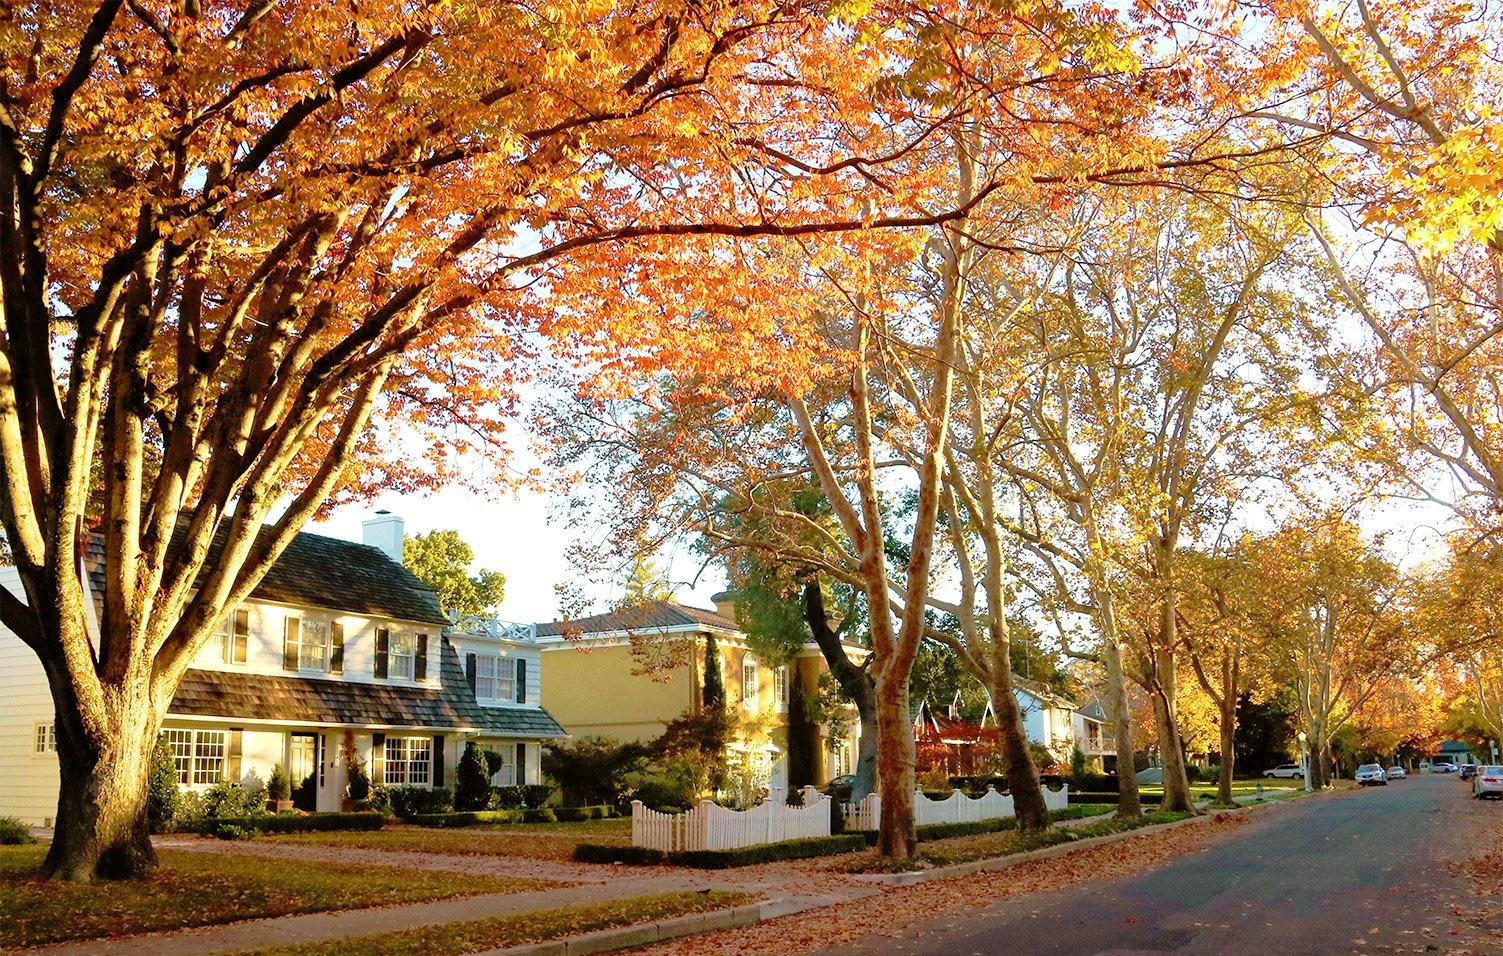 Sacramento: Best City in California for Fall Colors? via @sacramentopress